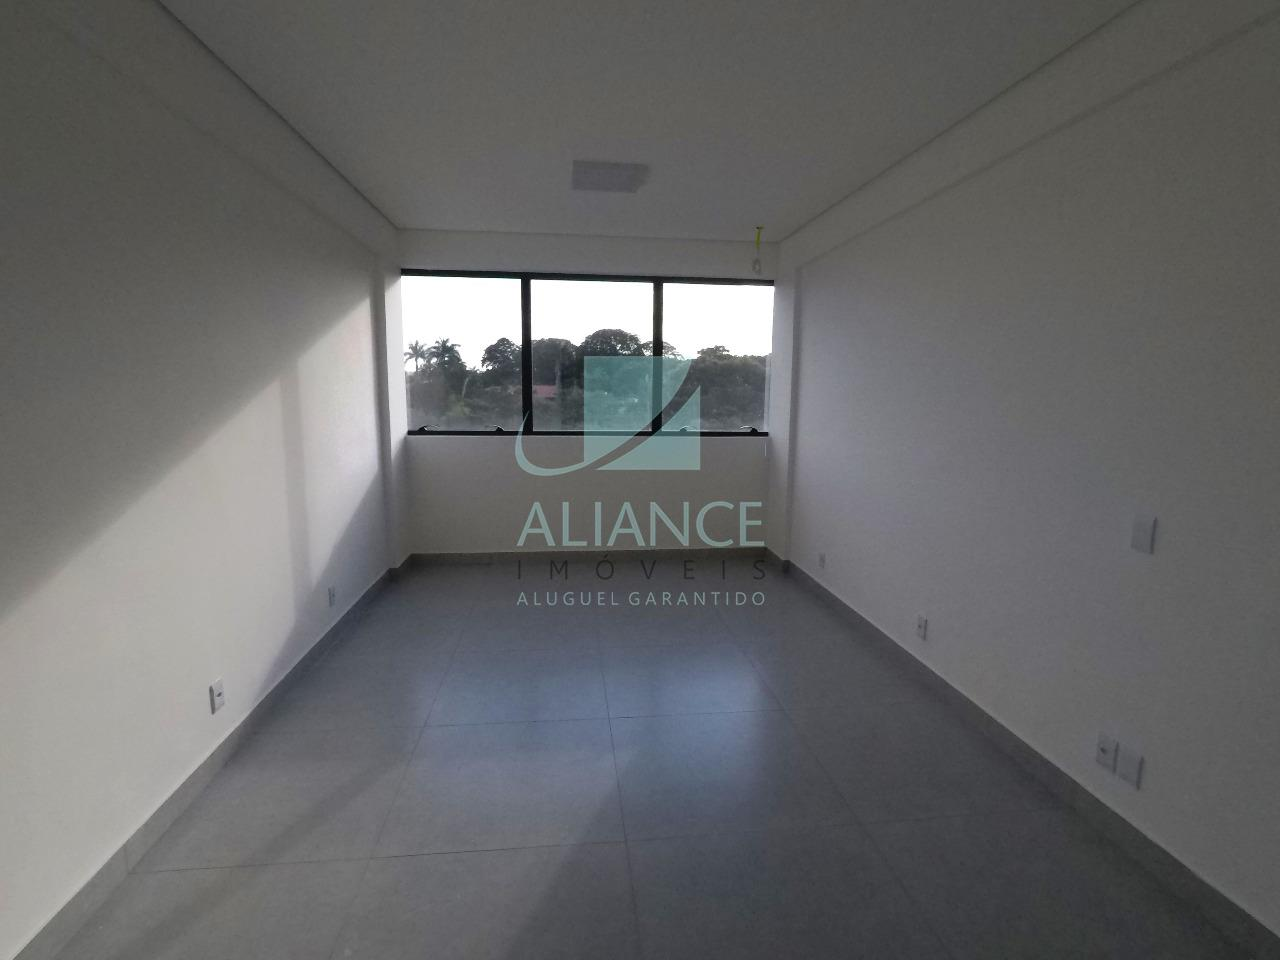 Salas para aluguel no Joana D'arc: